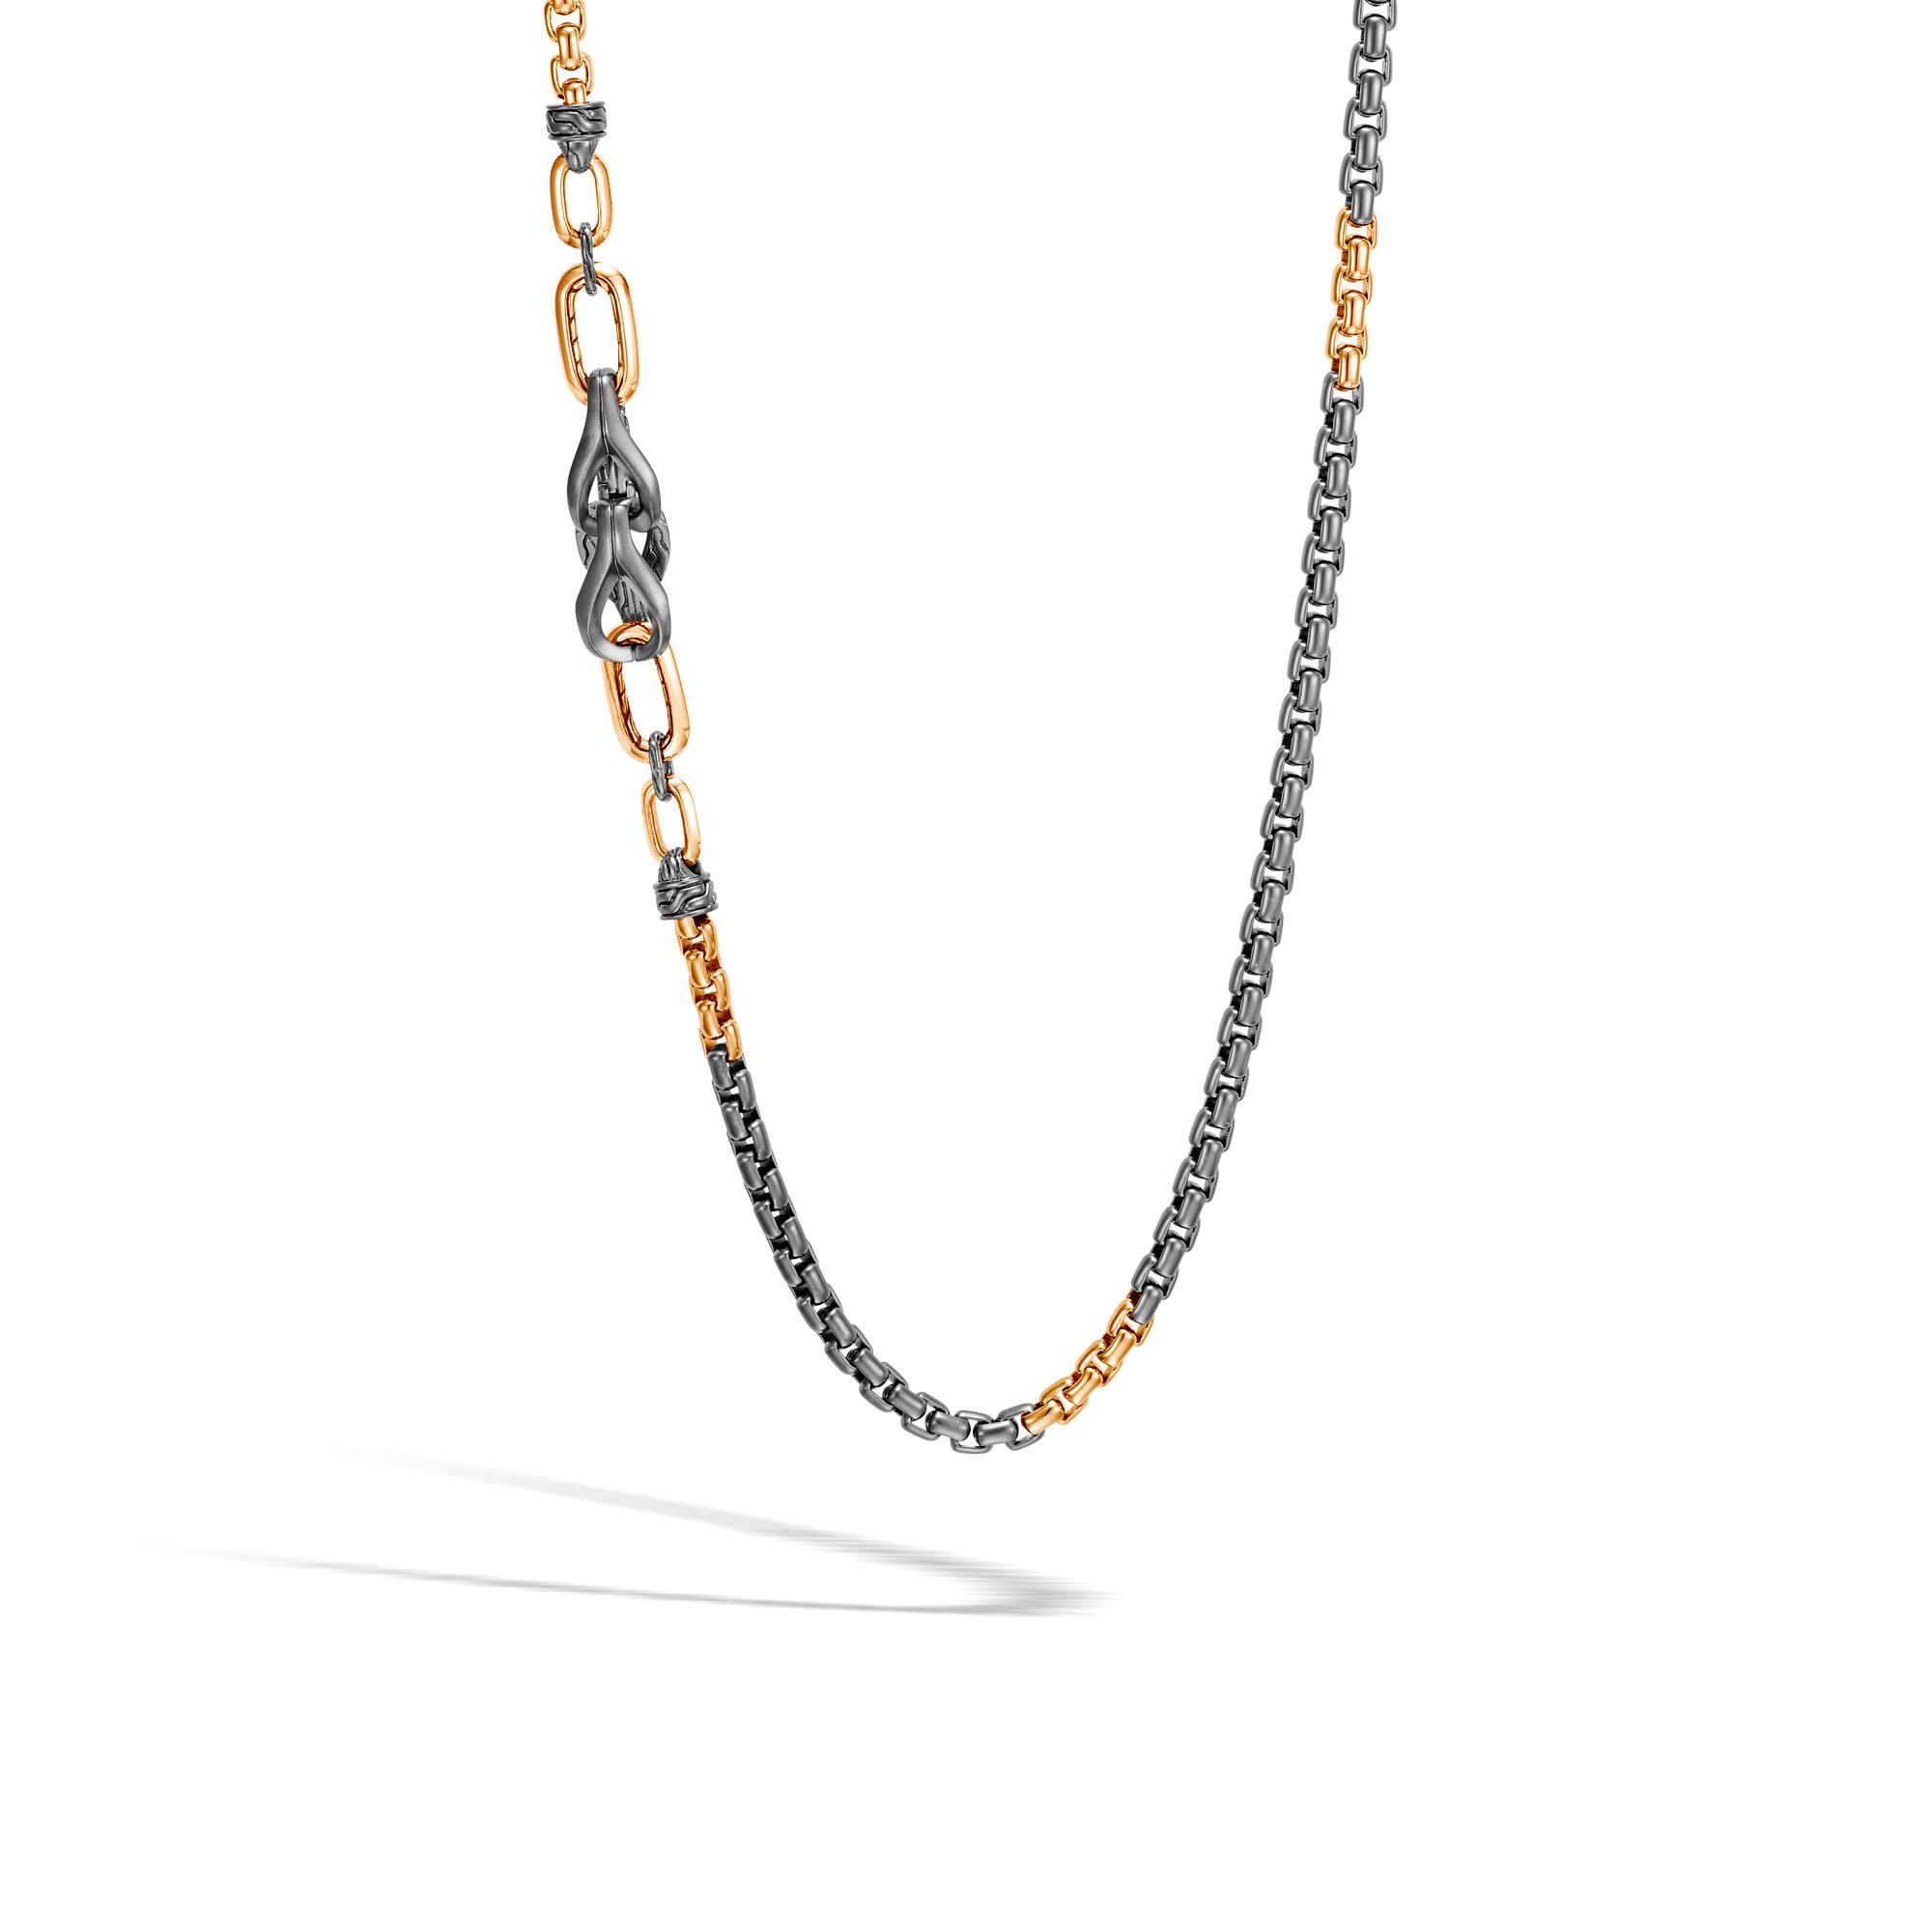 7a9085171e0ef6 John Hardy. Men's Metallic Asli Classic Chain Link Box Chain Necklace